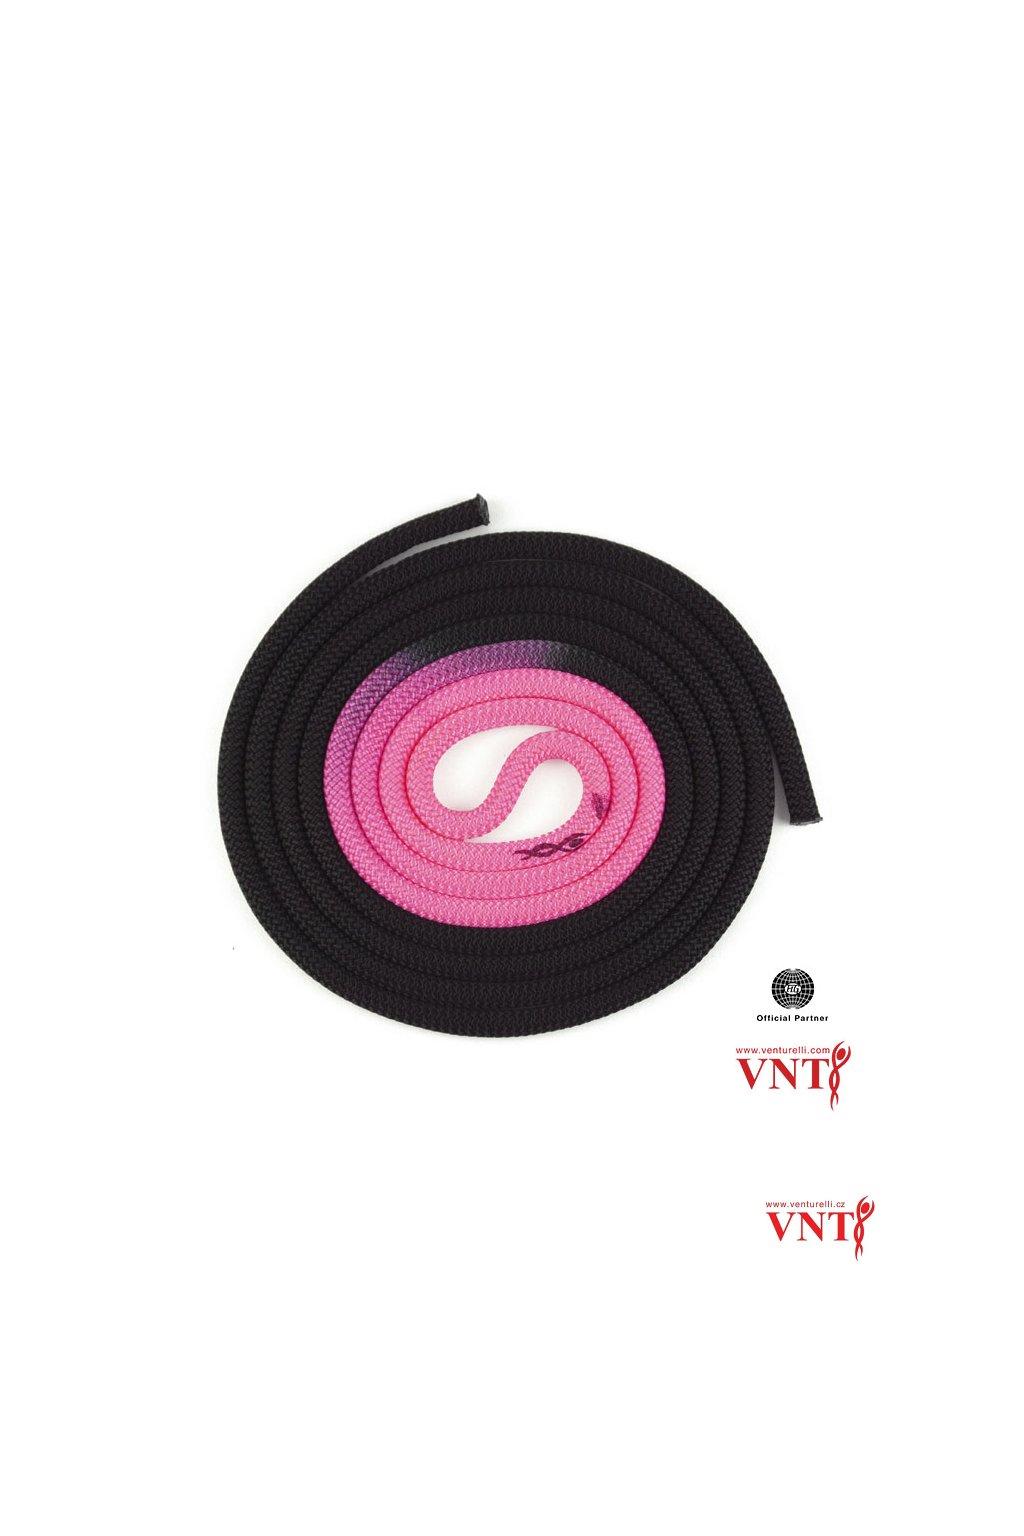 černá neon růžová